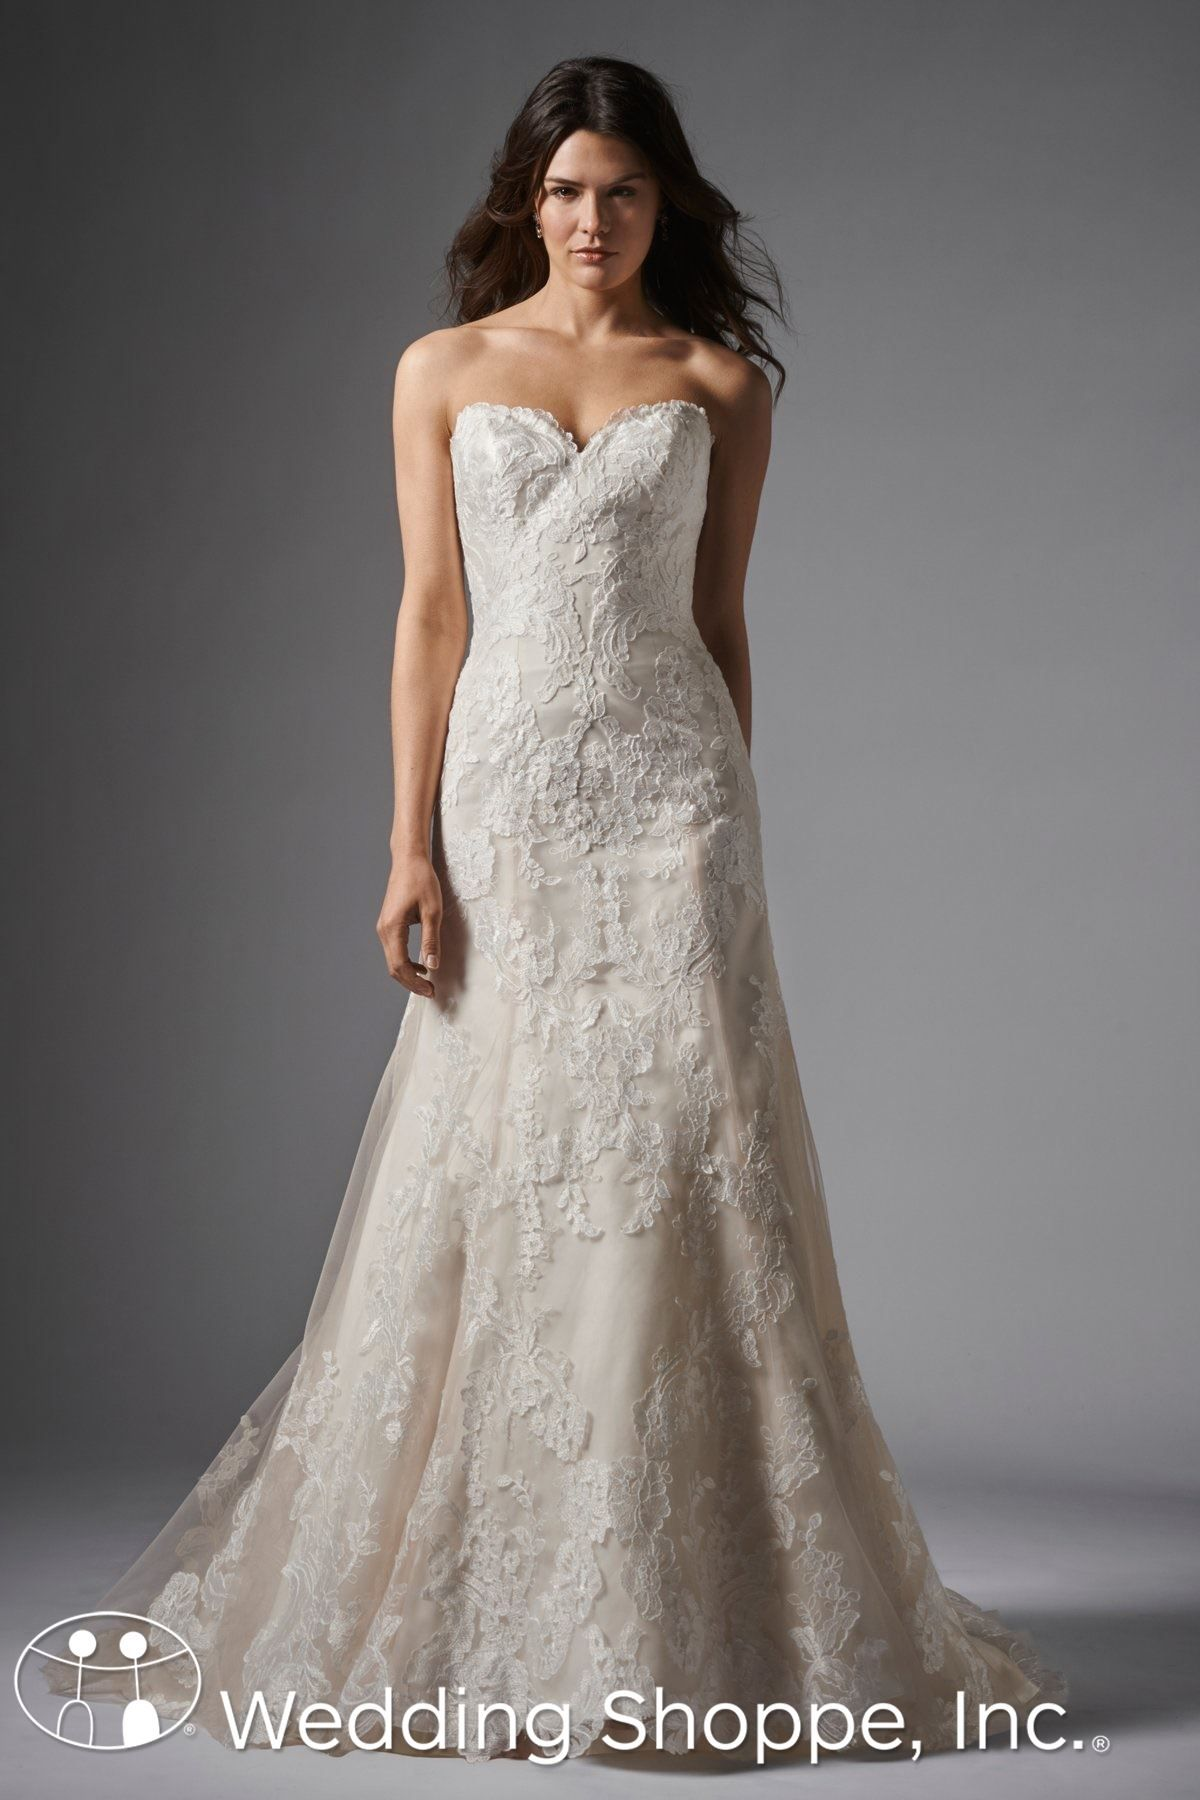 Awesome Wedding Dresses In Derby Embellishment - Wedding Dress Ideas ...